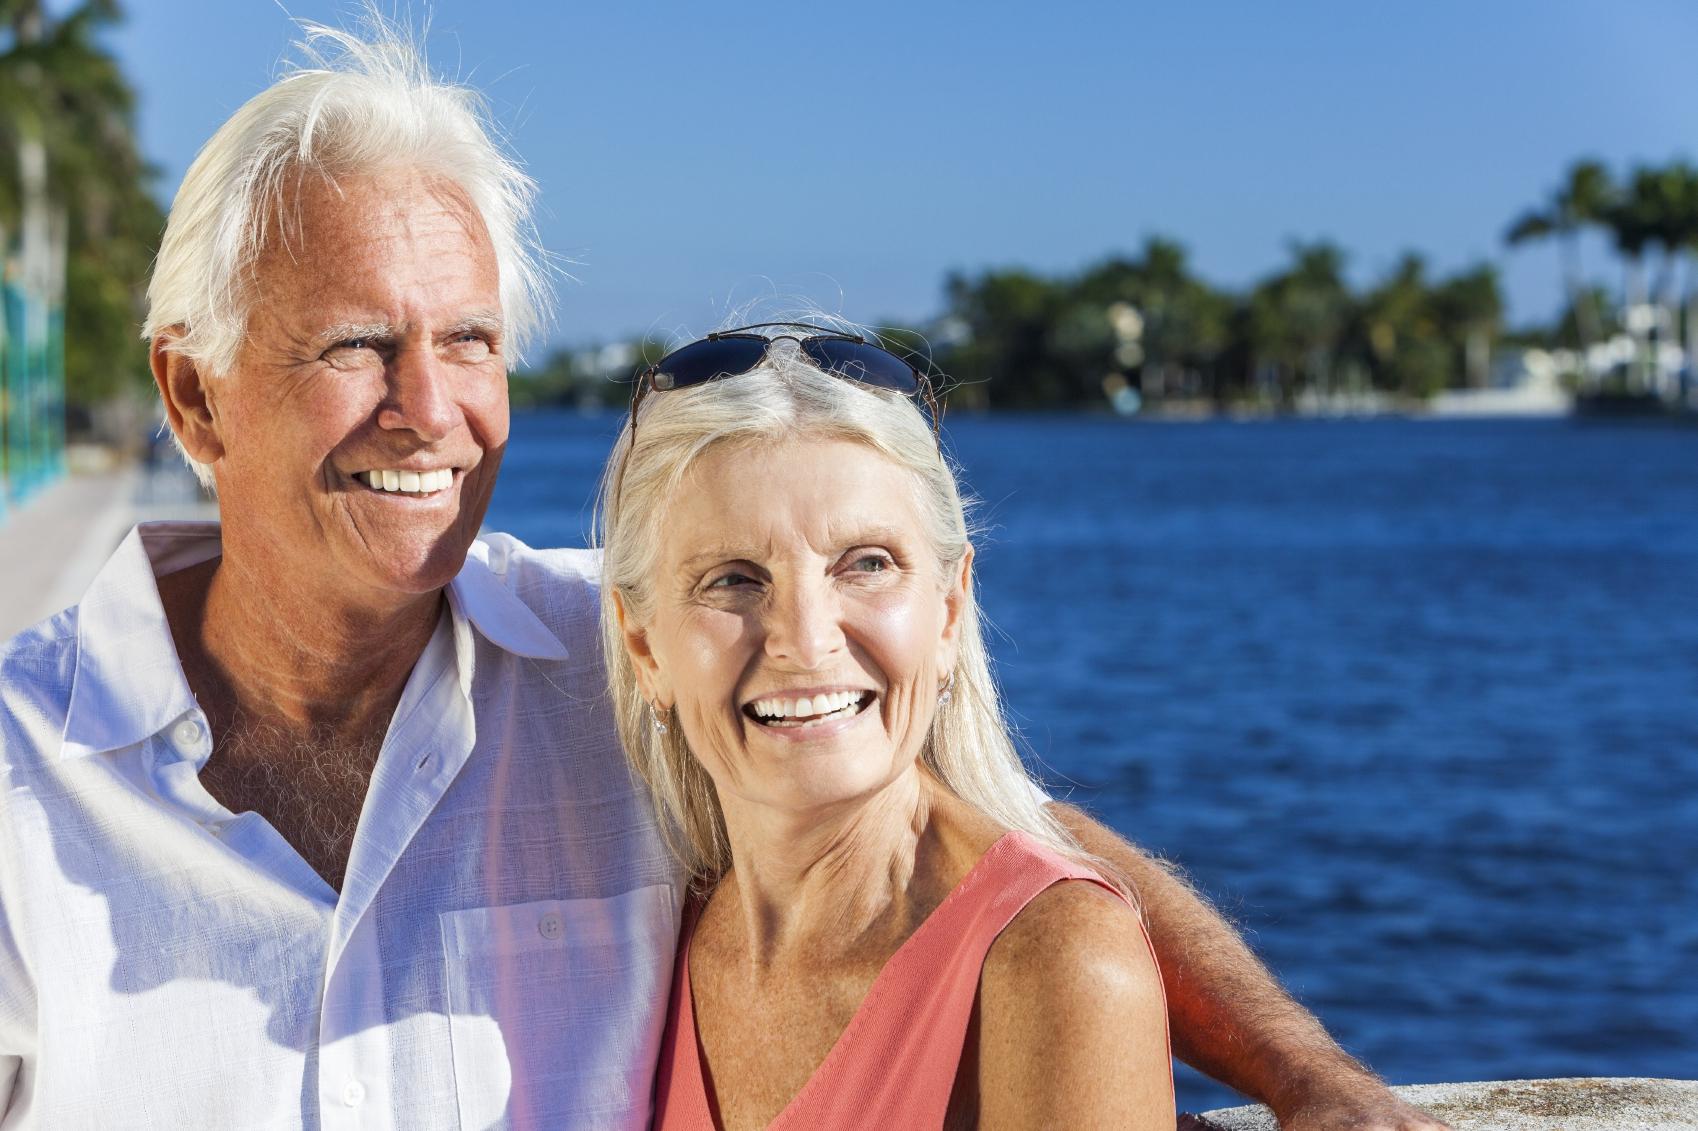 Older Couple in Sunshine - iStock_000022936415_Medium